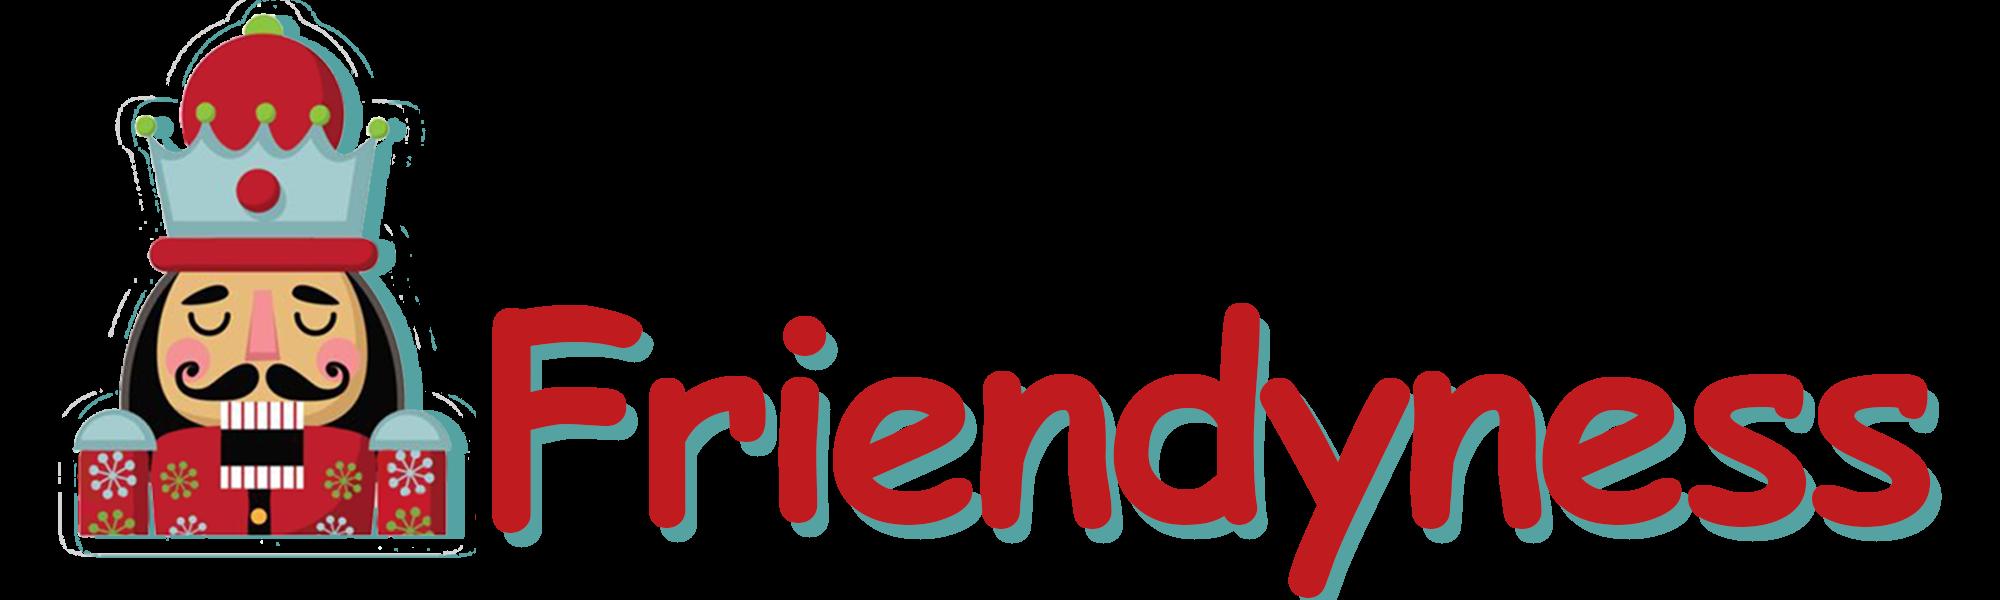 Friendyness